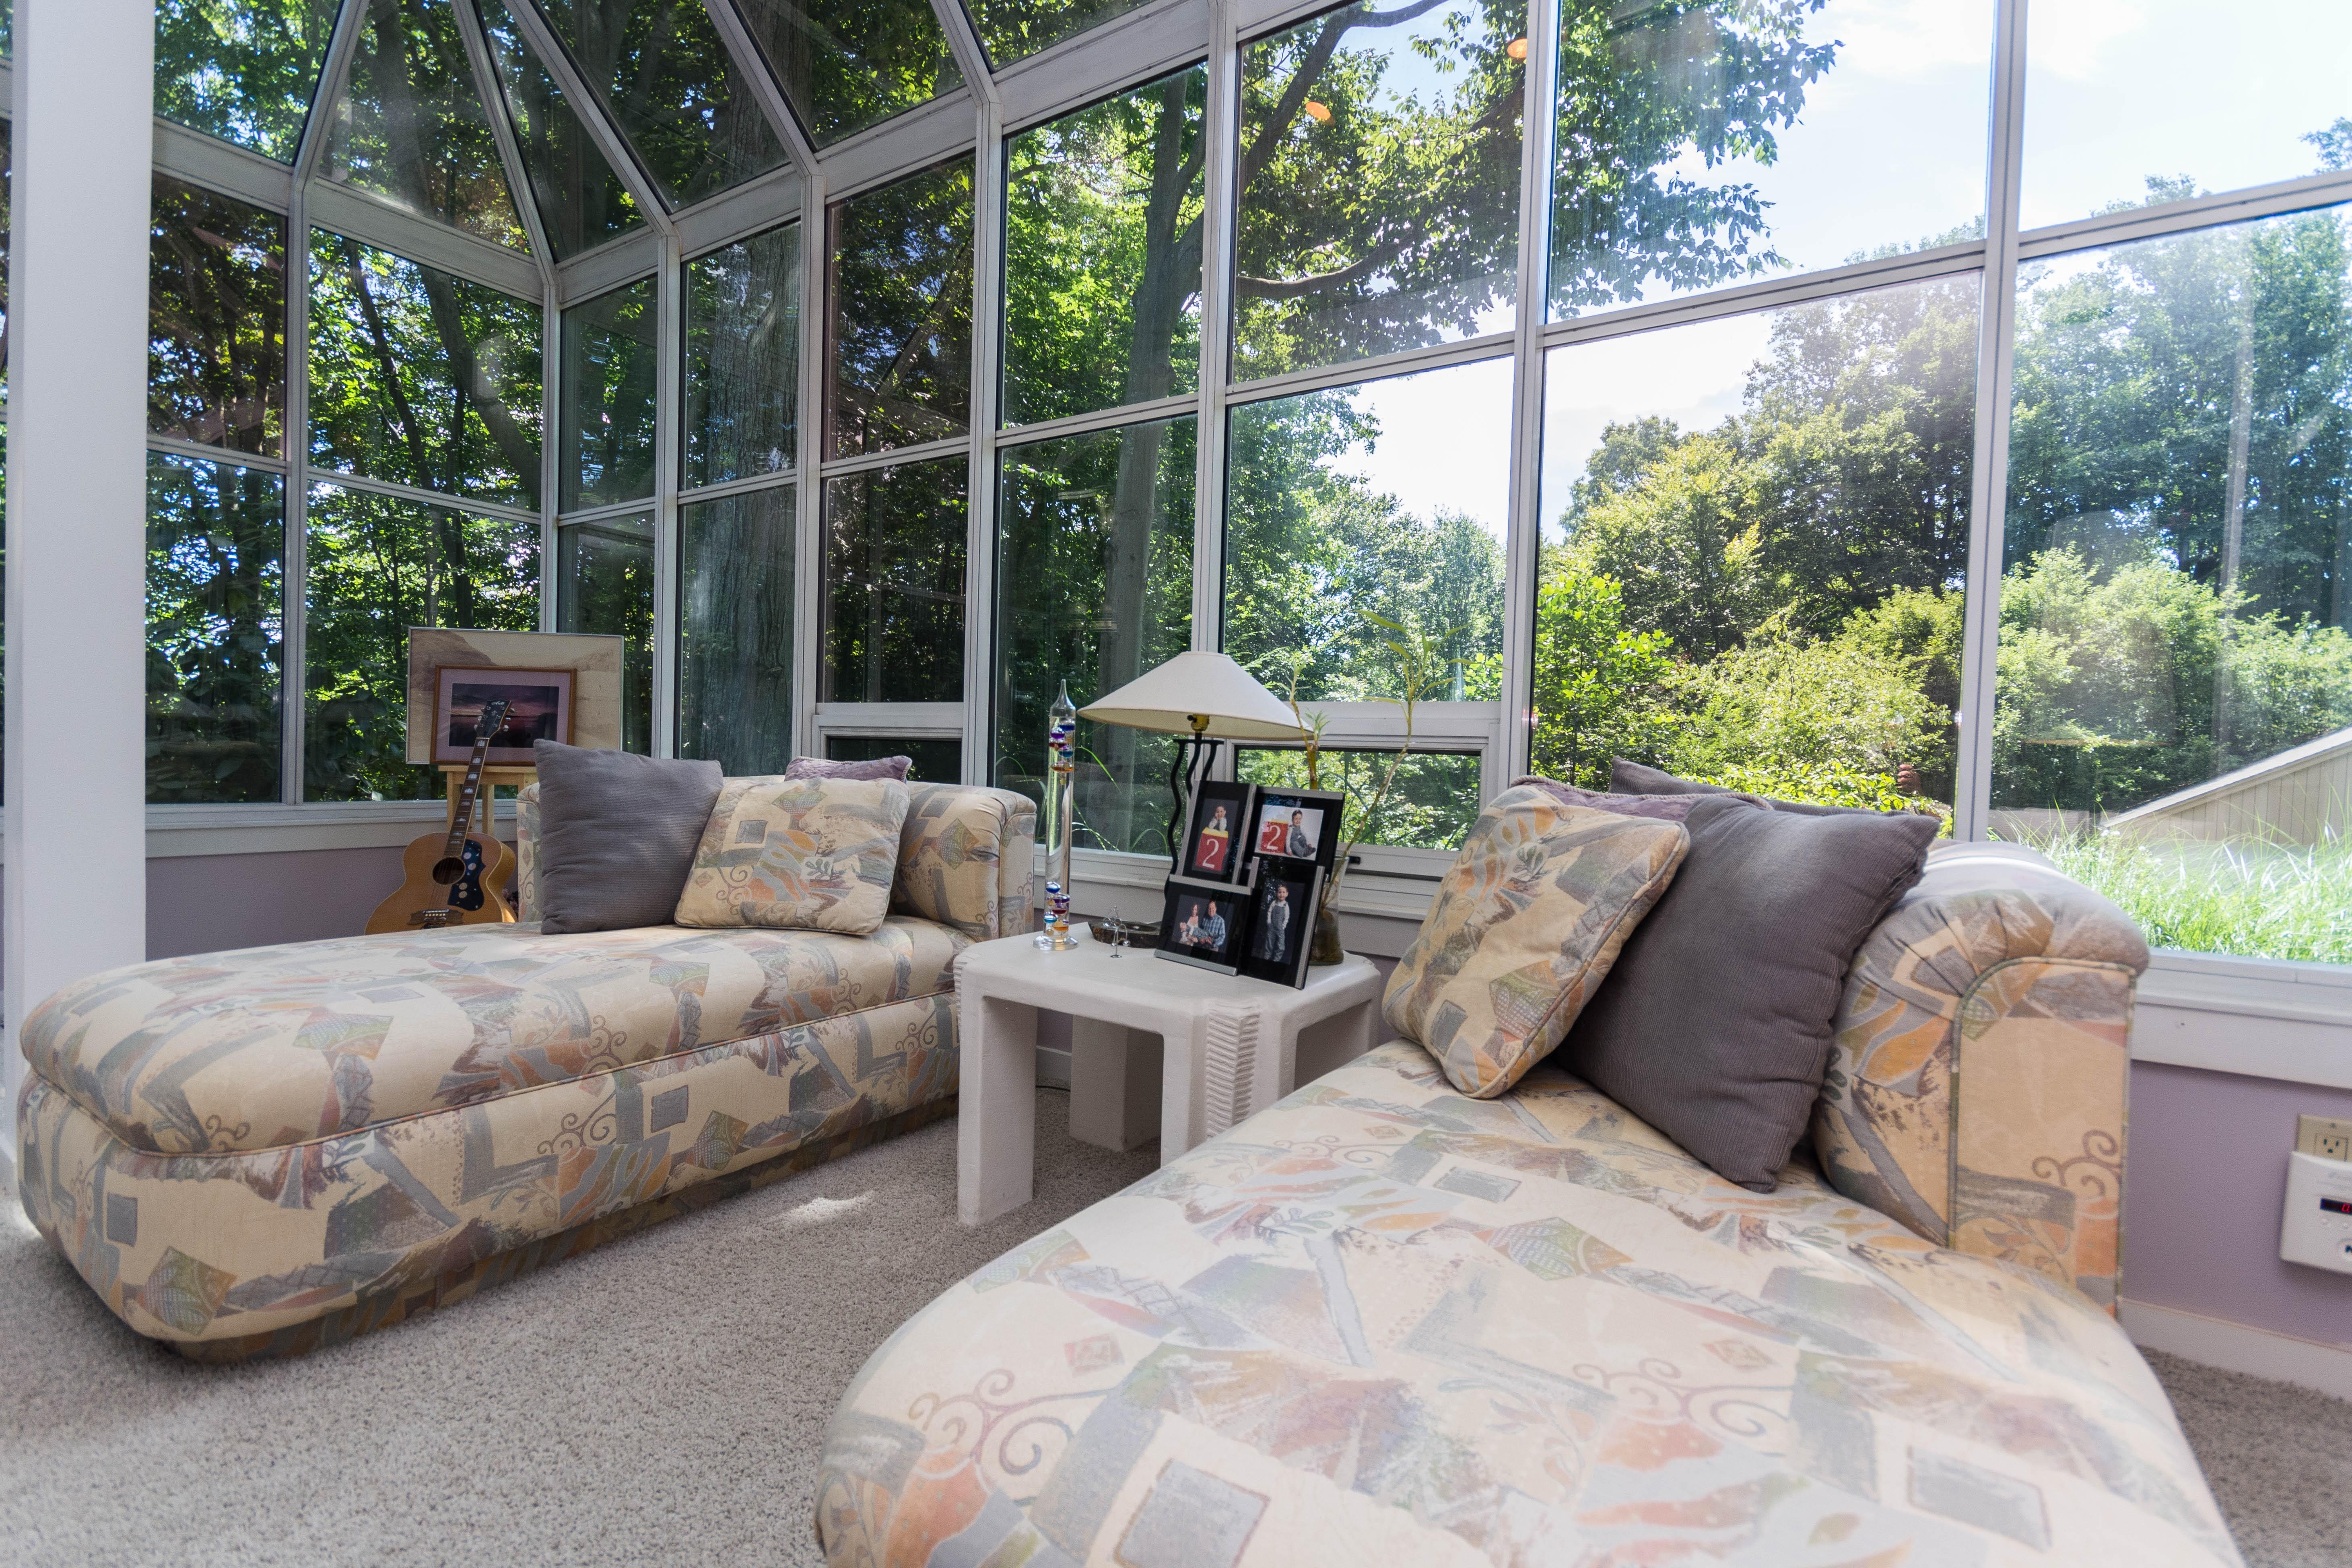 Casa Unifamiliar por un Venta en Custom Built Home 100 Ferndale Drive Easton, Connecticut 06612 Estados Unidos